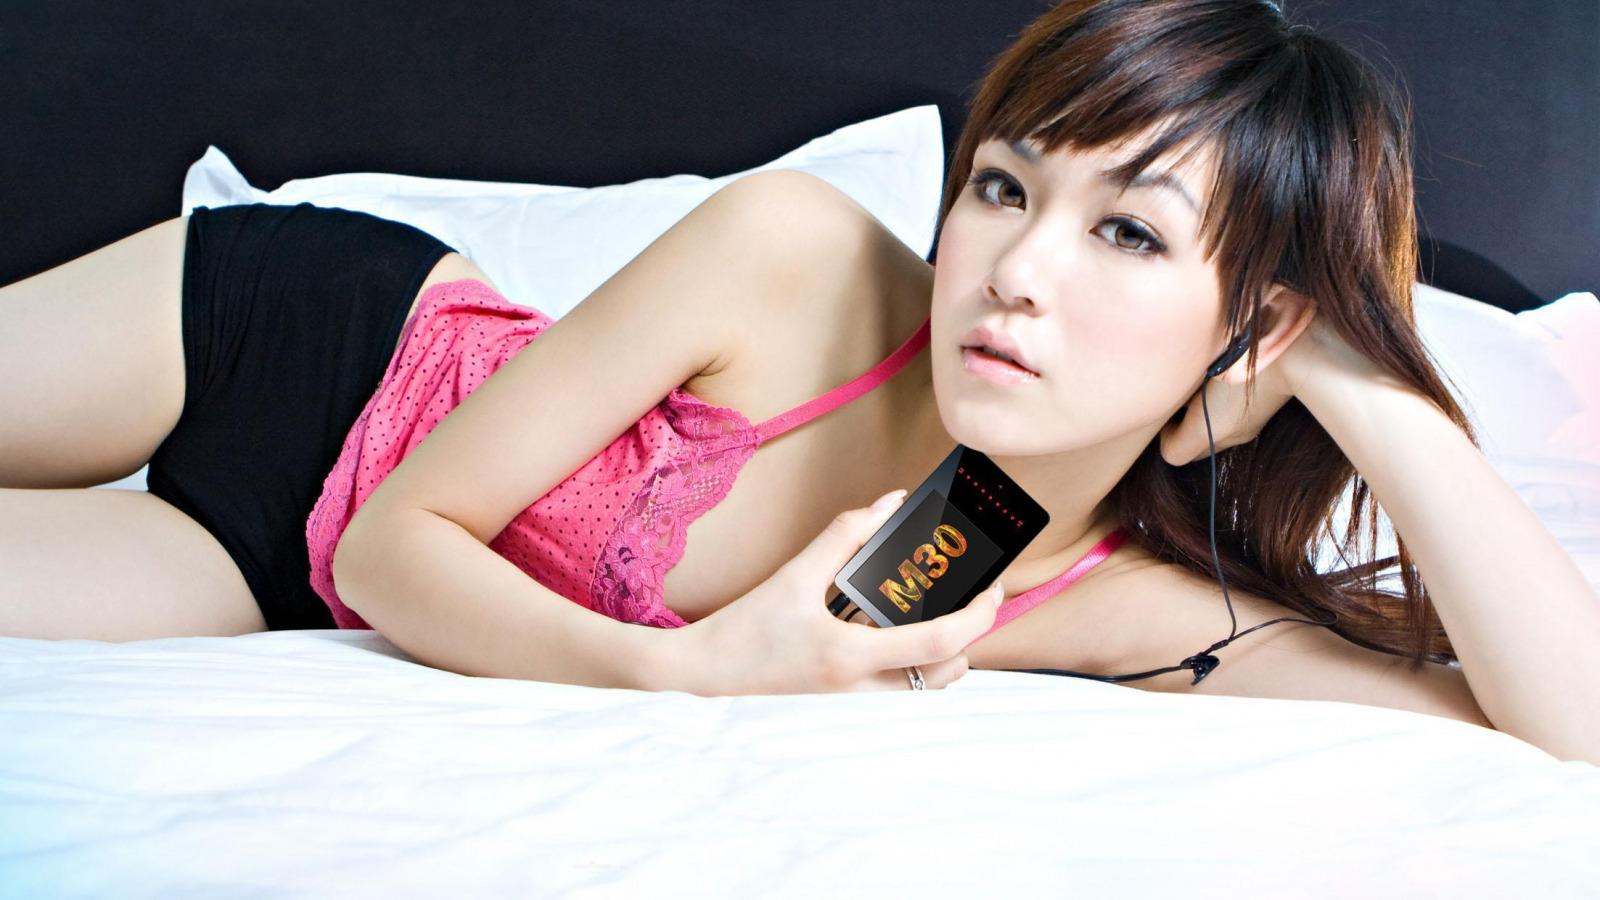 молоденькие девушки мастурбируют онлайн-хв5